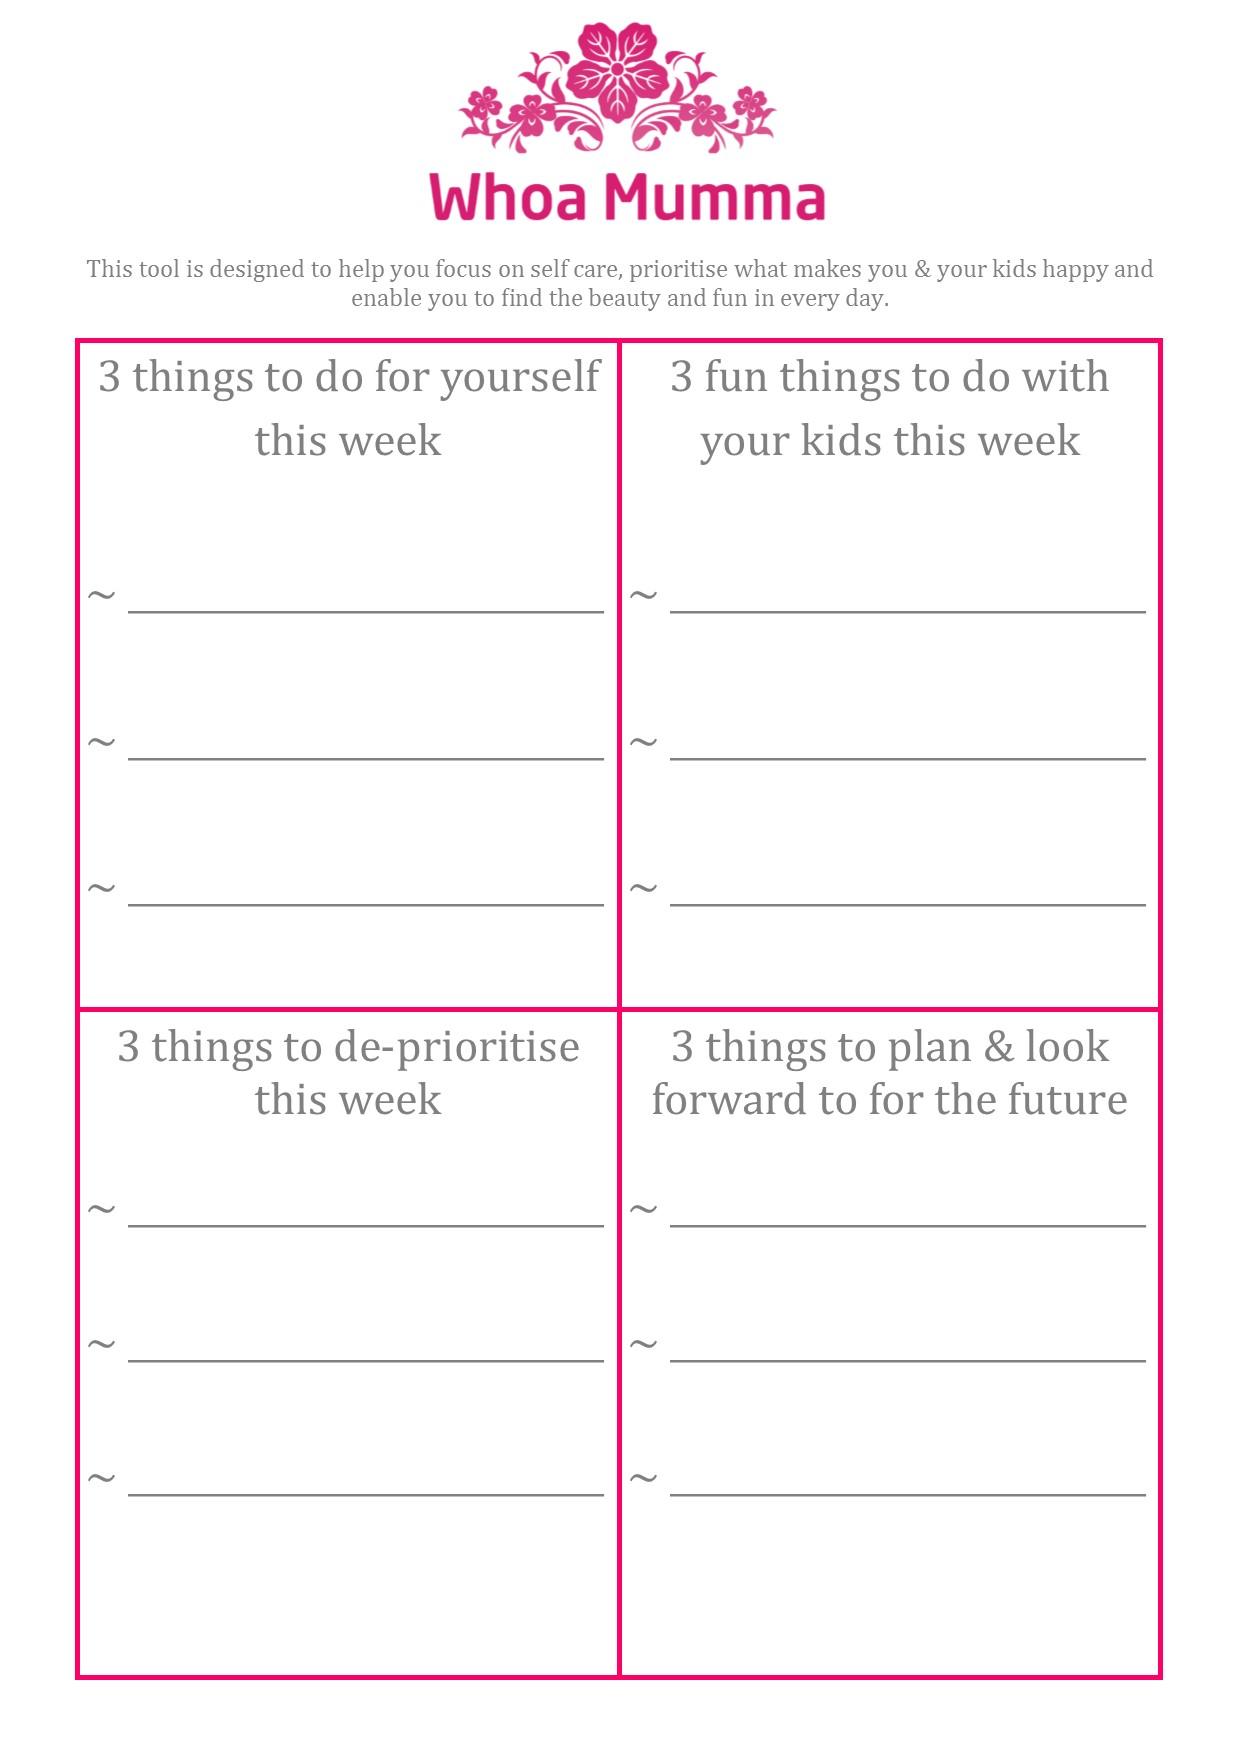 worksheet Self Care Plan Worksheet tools whoa mumma